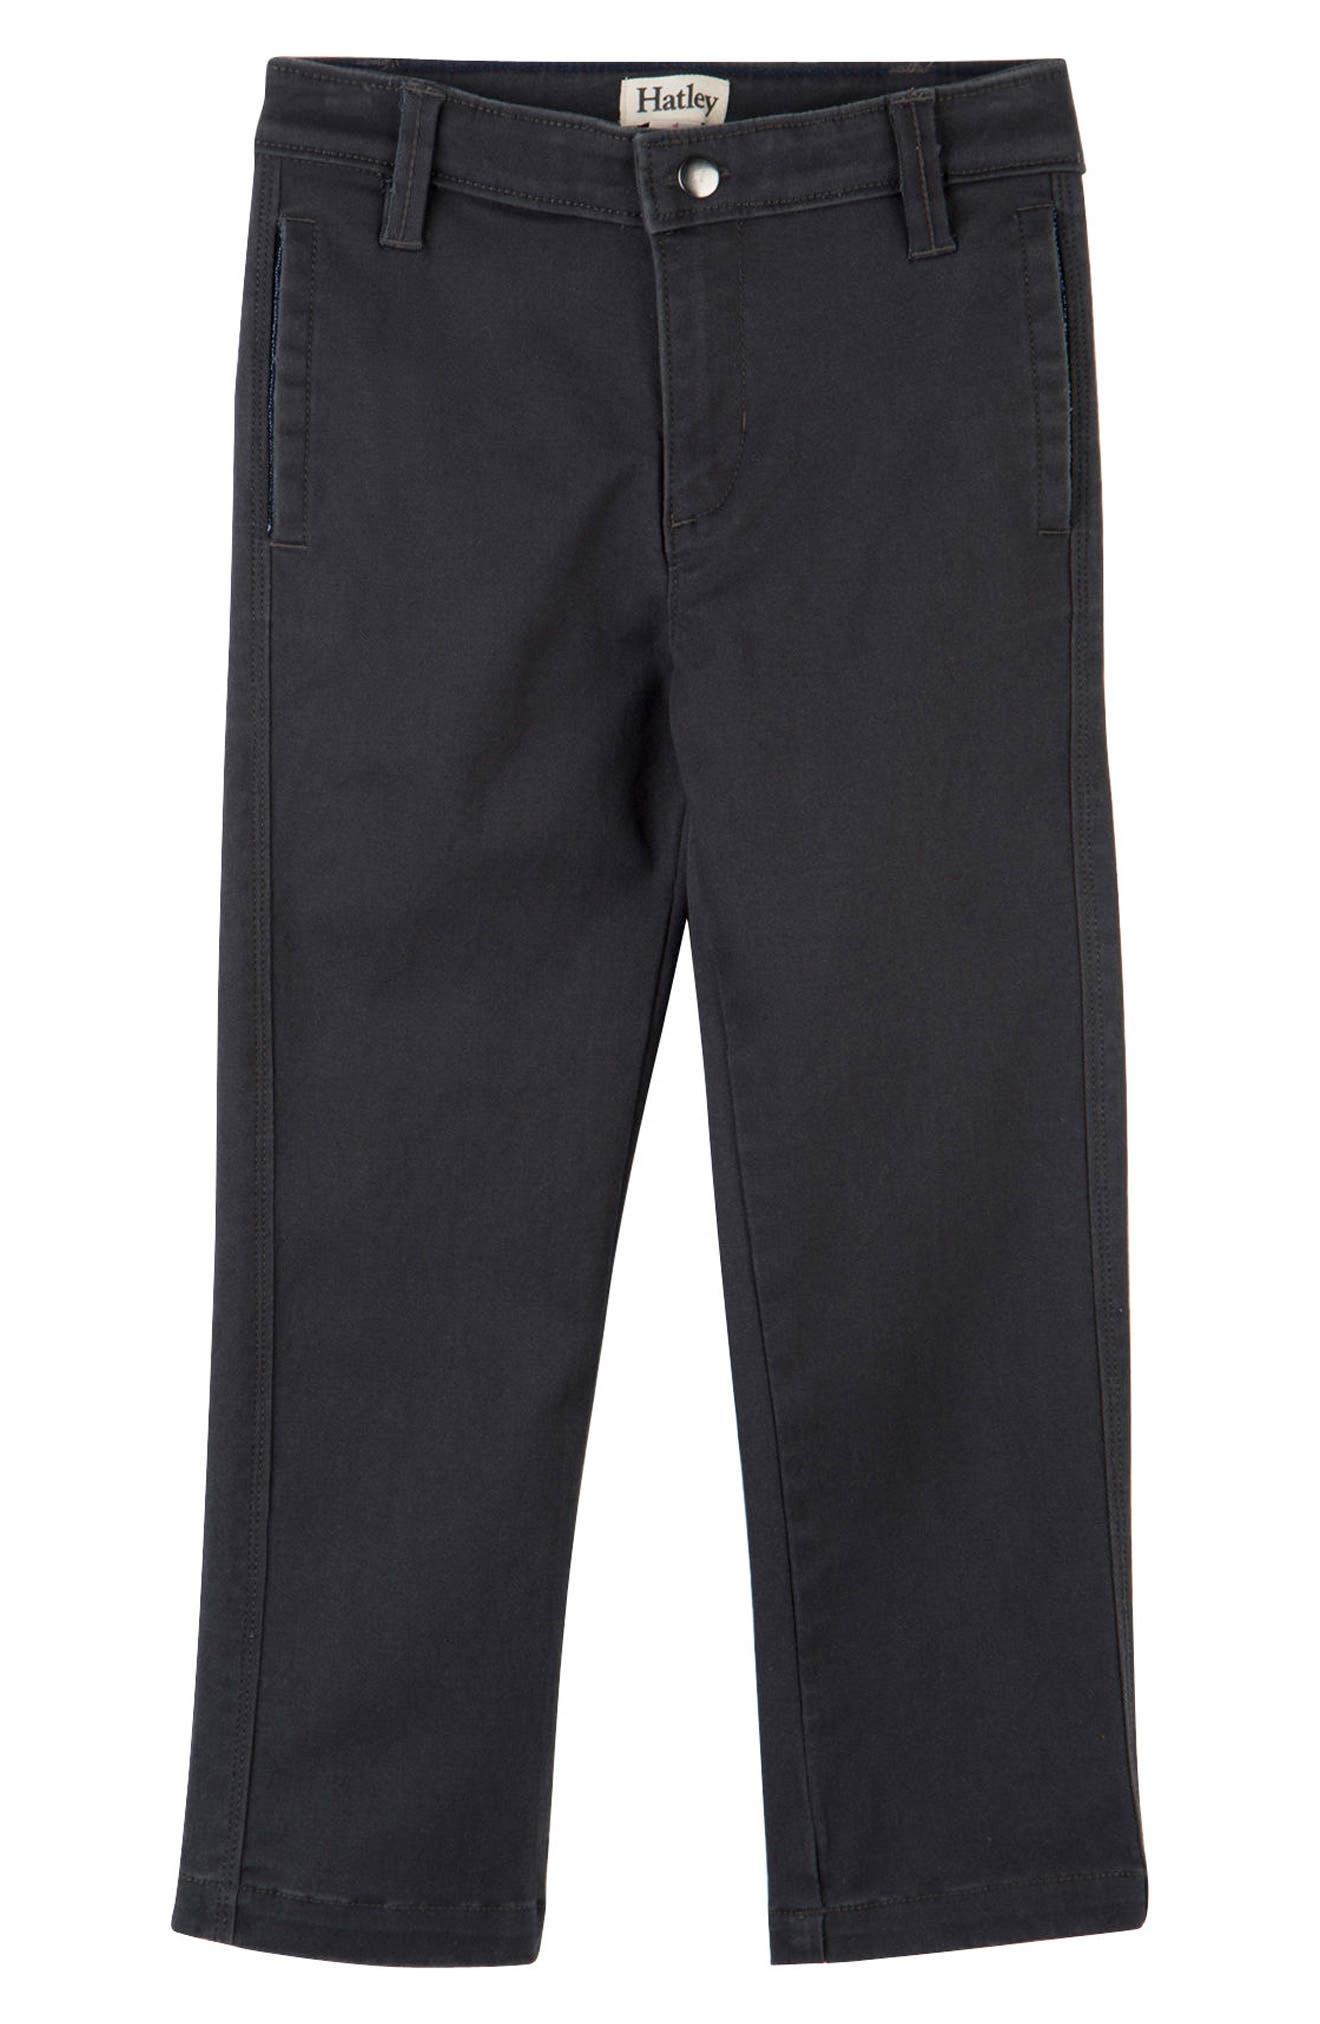 HATLEY, Stretch Cotton Twill Pants, Main thumbnail 1, color, 020